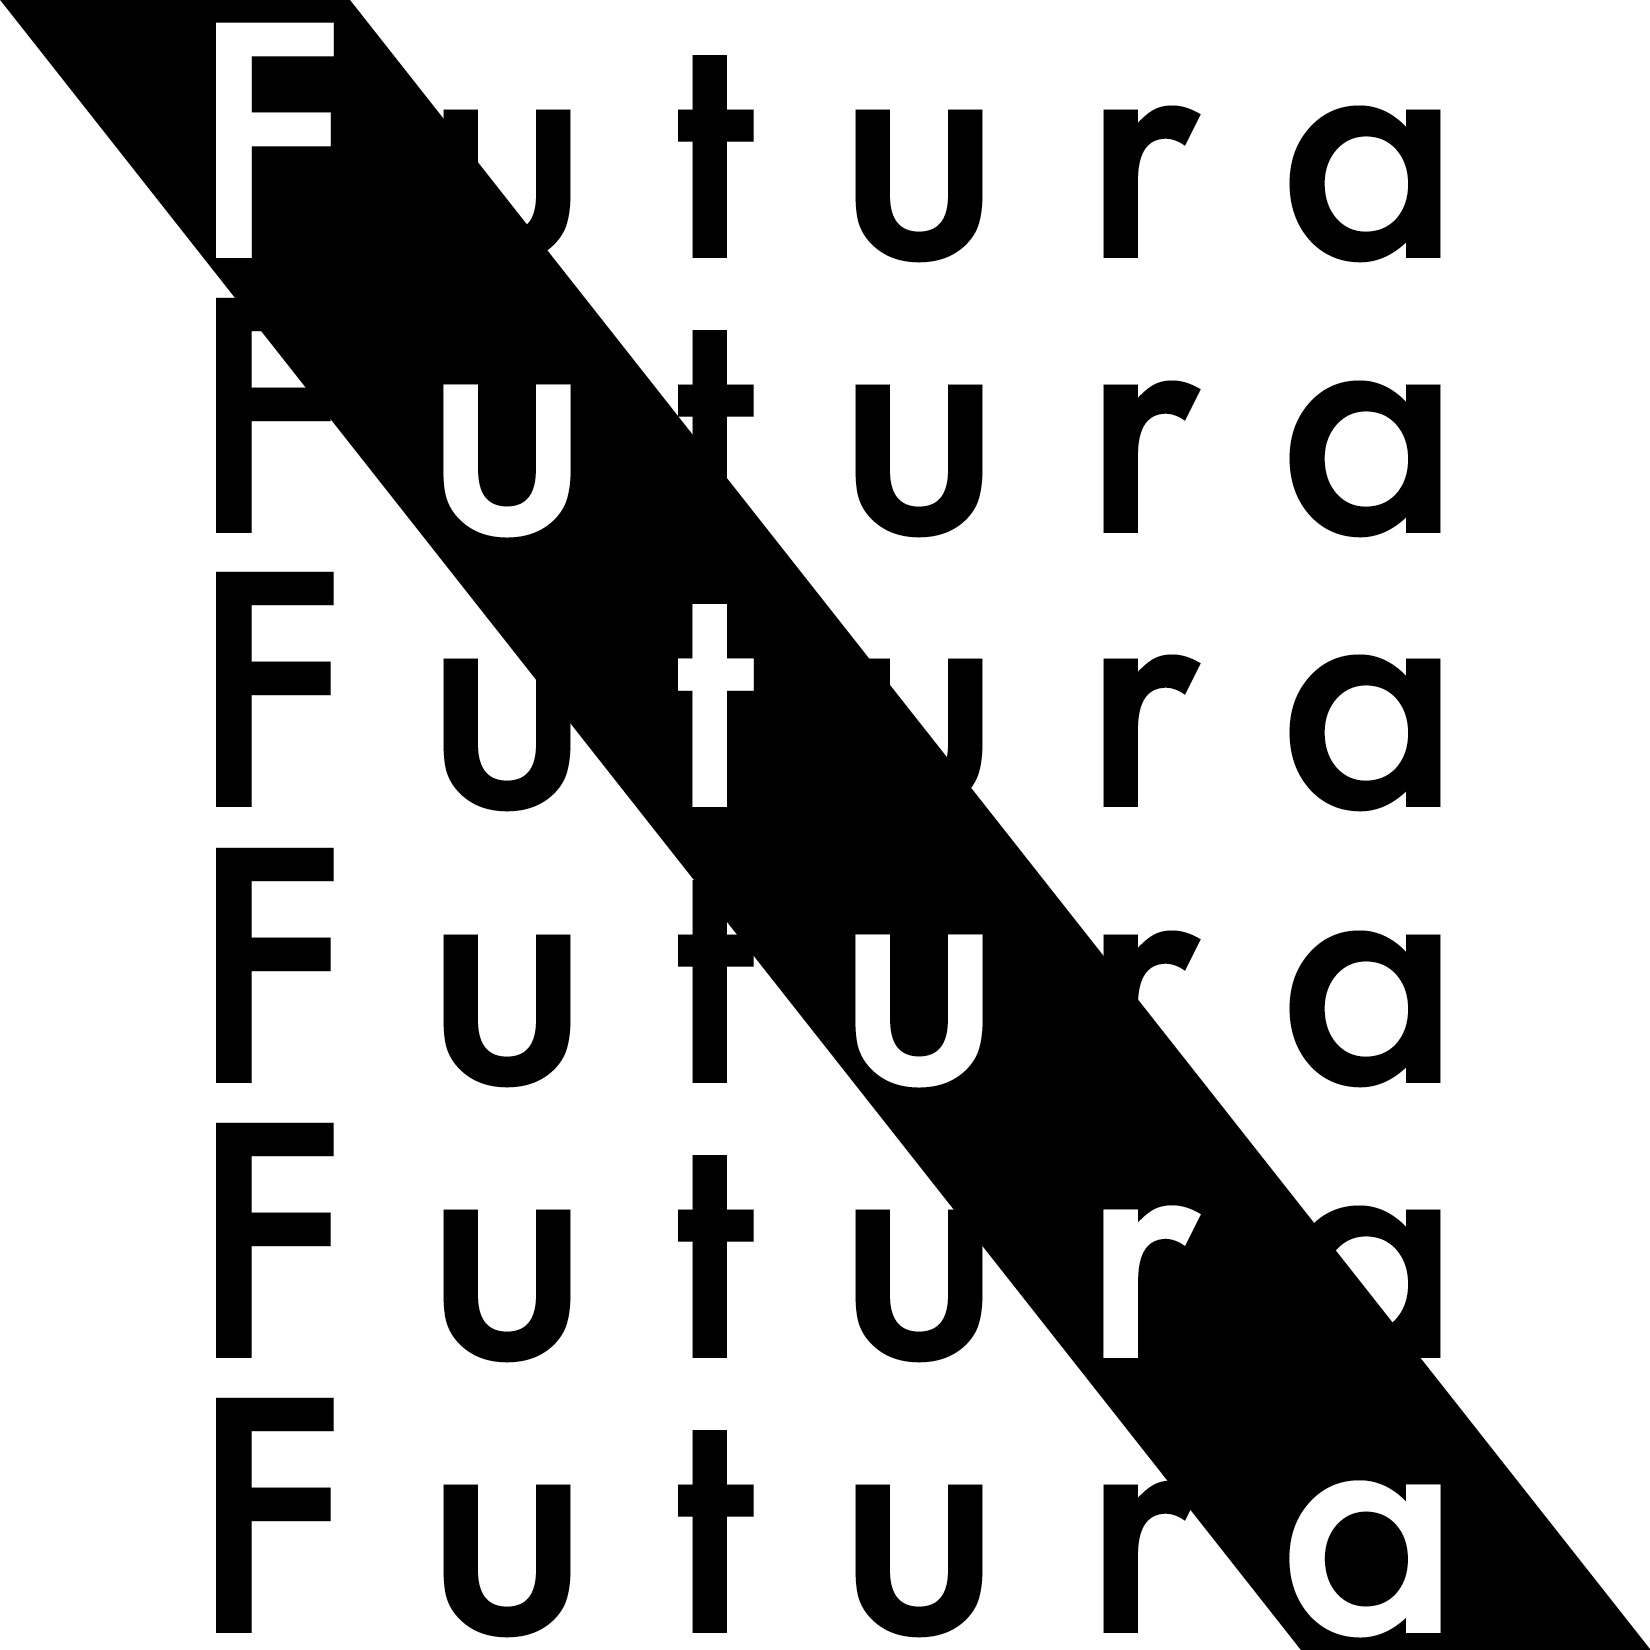 jacob futura